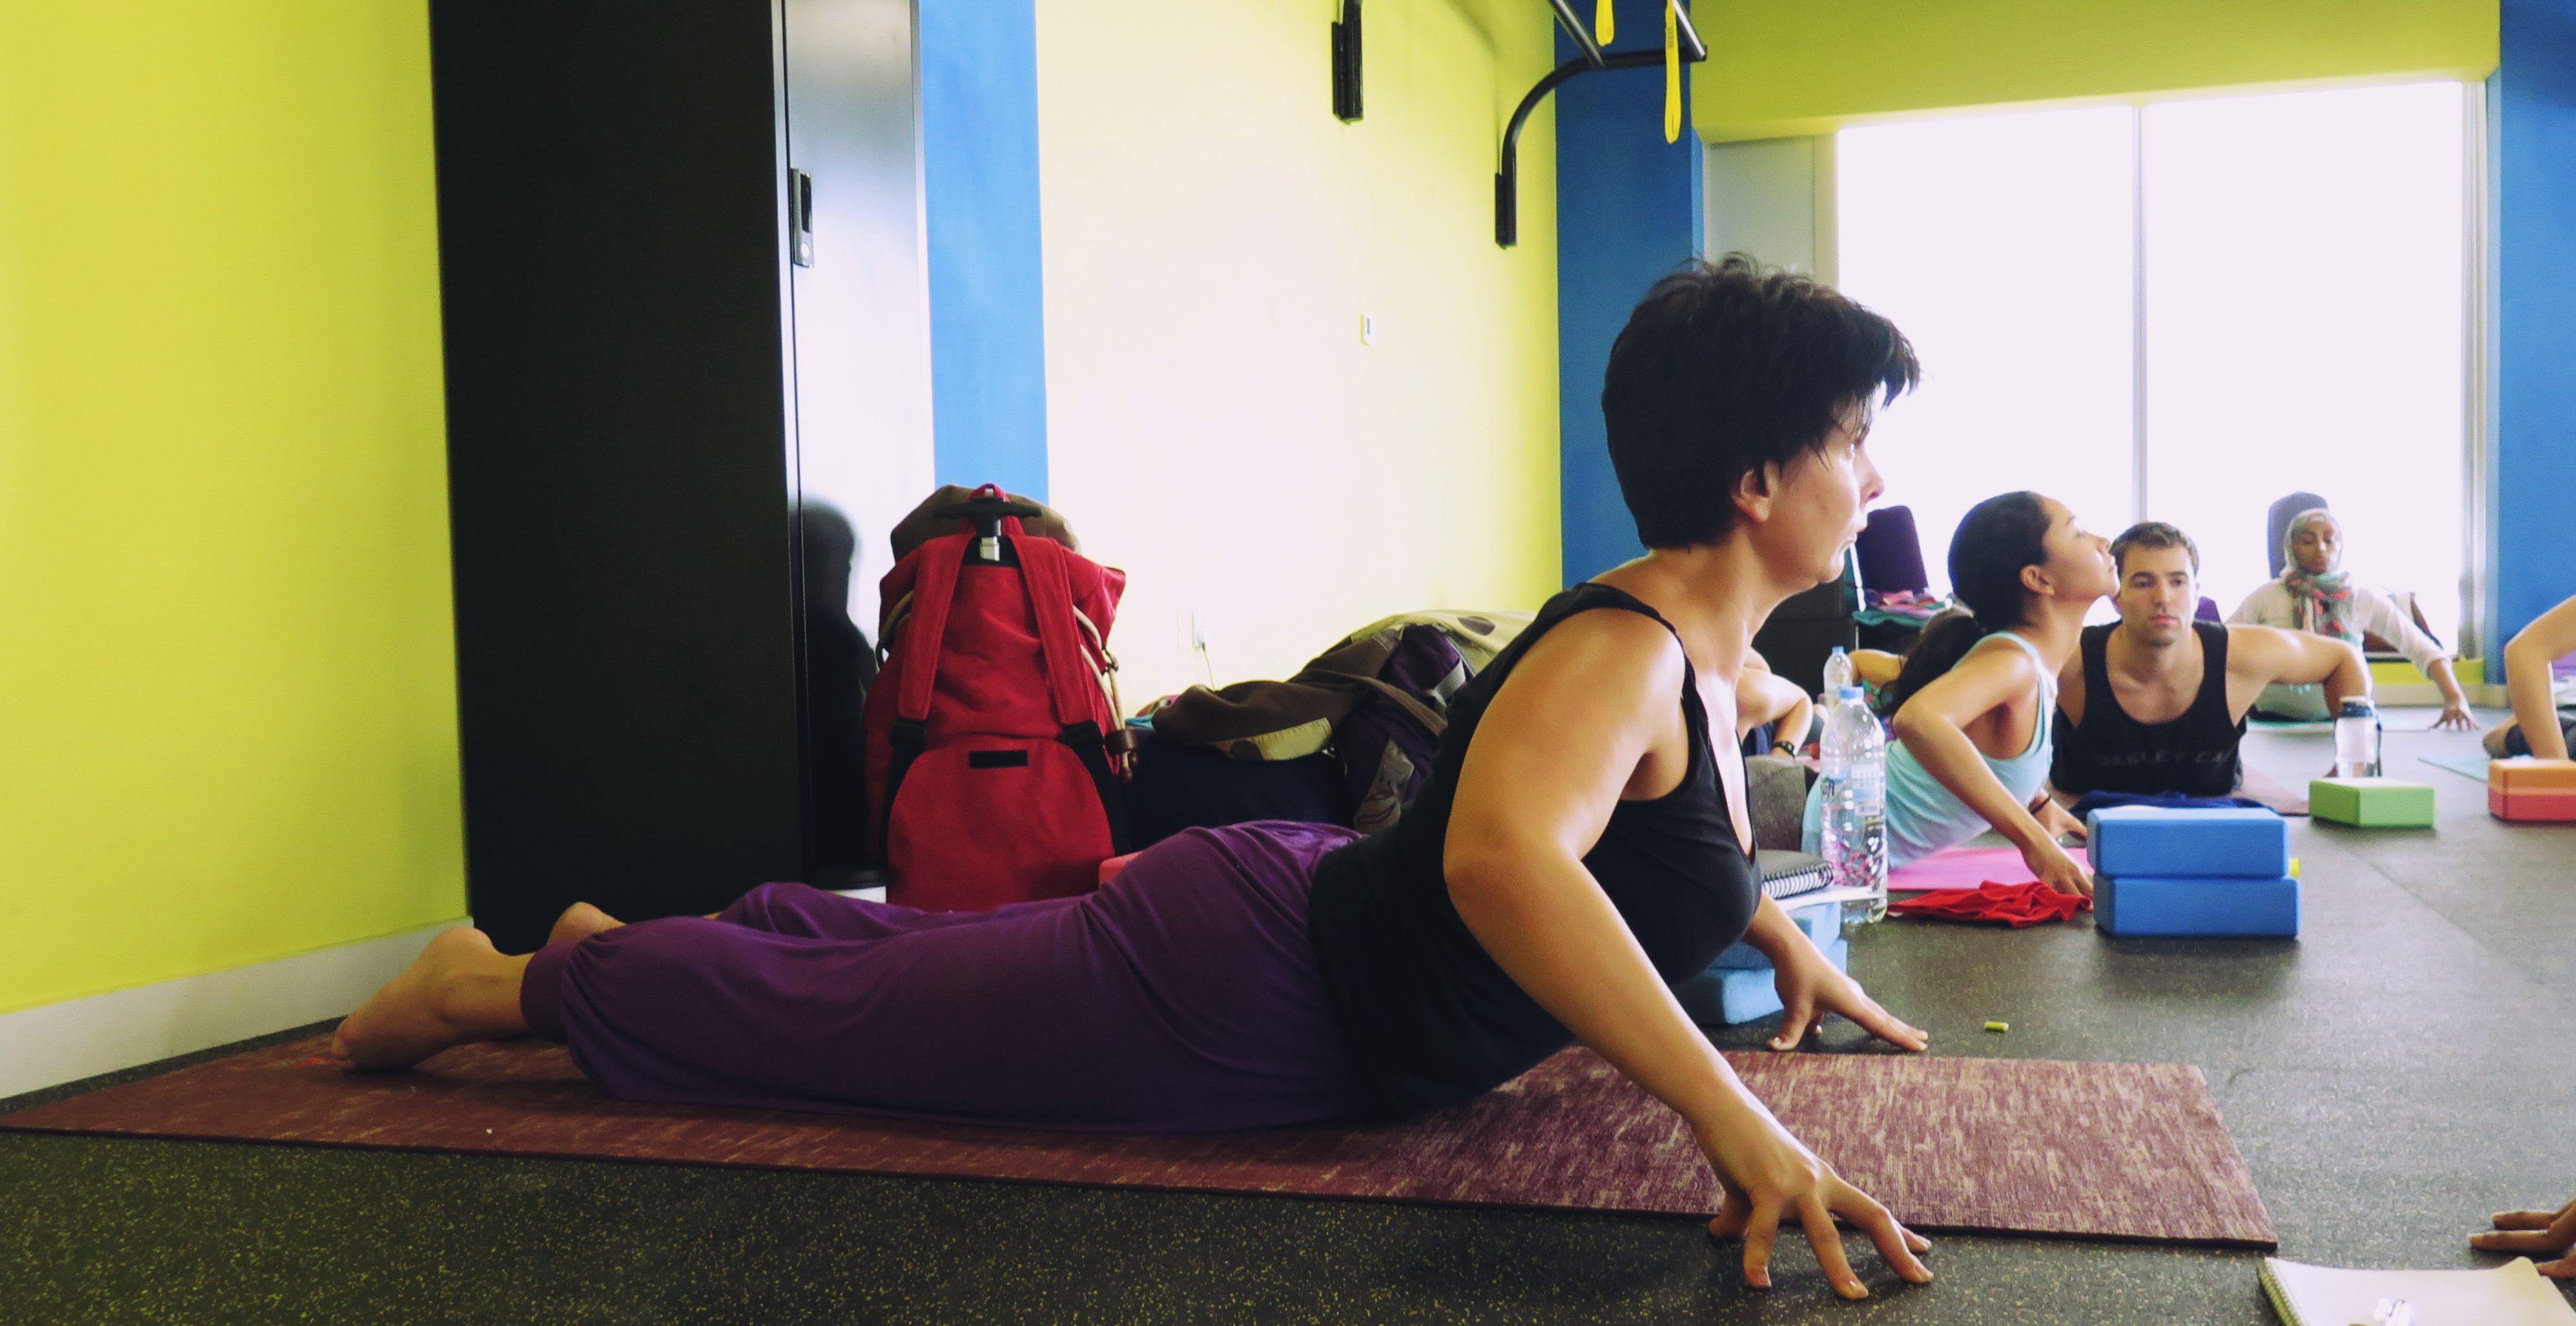 jade mats professional jadeyoga yoga canada mat harmonyprofessionalmat xl harmony